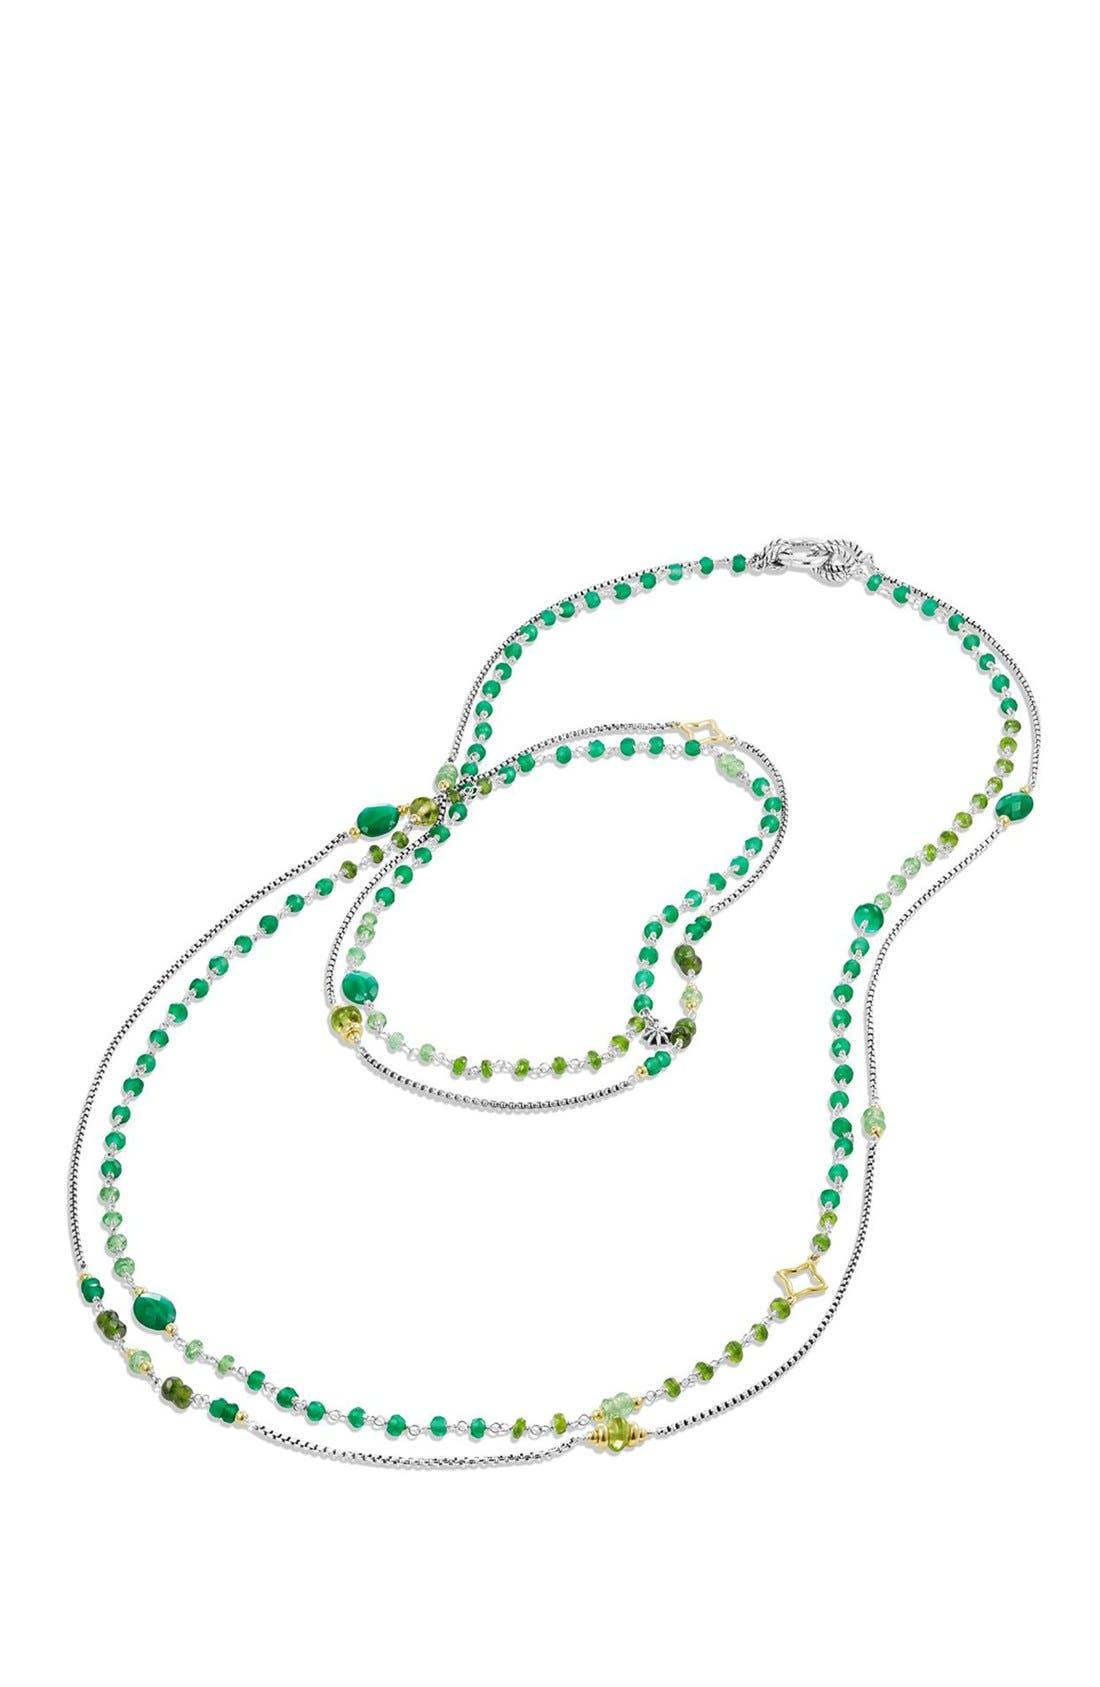 Main Image - David Yurman 'Bead and Chain' Bead Necklace with Carnelian, Garnet & 18K Gold